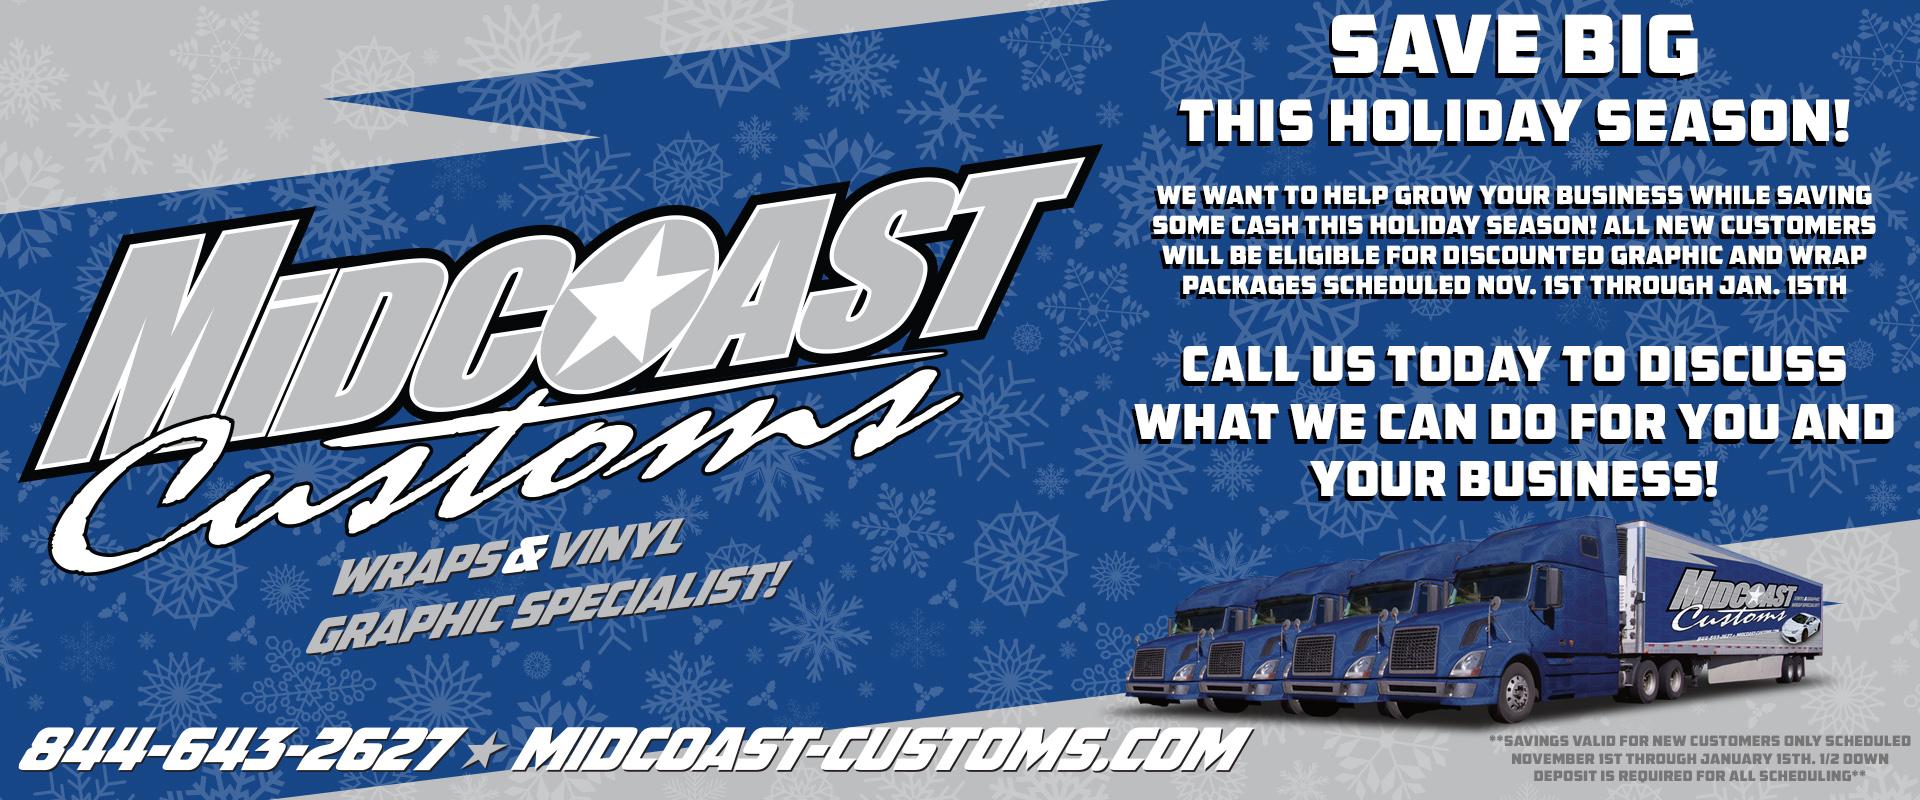 Midcoast Website Banner